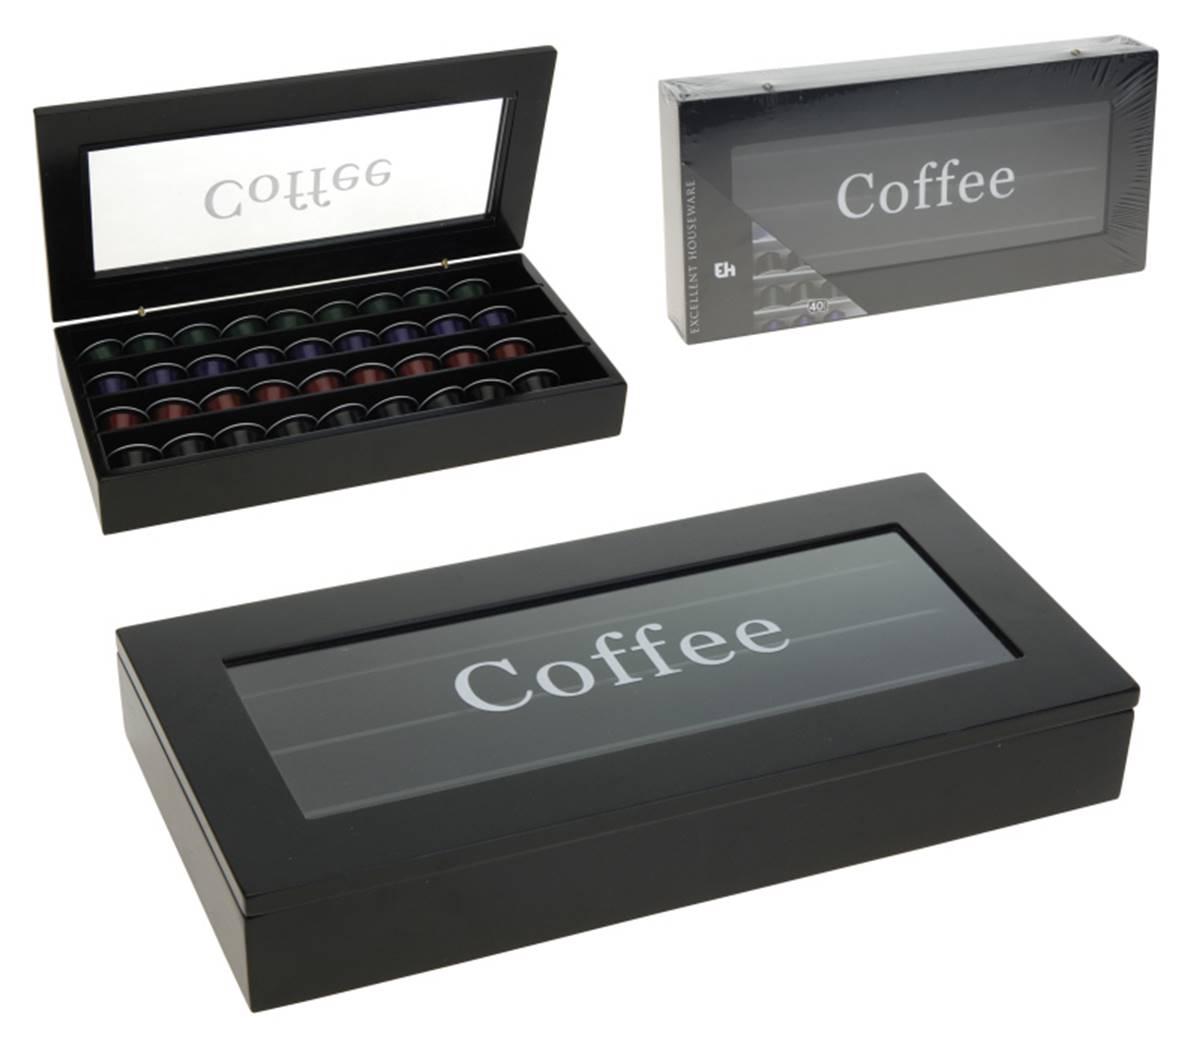 distributeur de capsules nespresso design bois noir 40 capsules